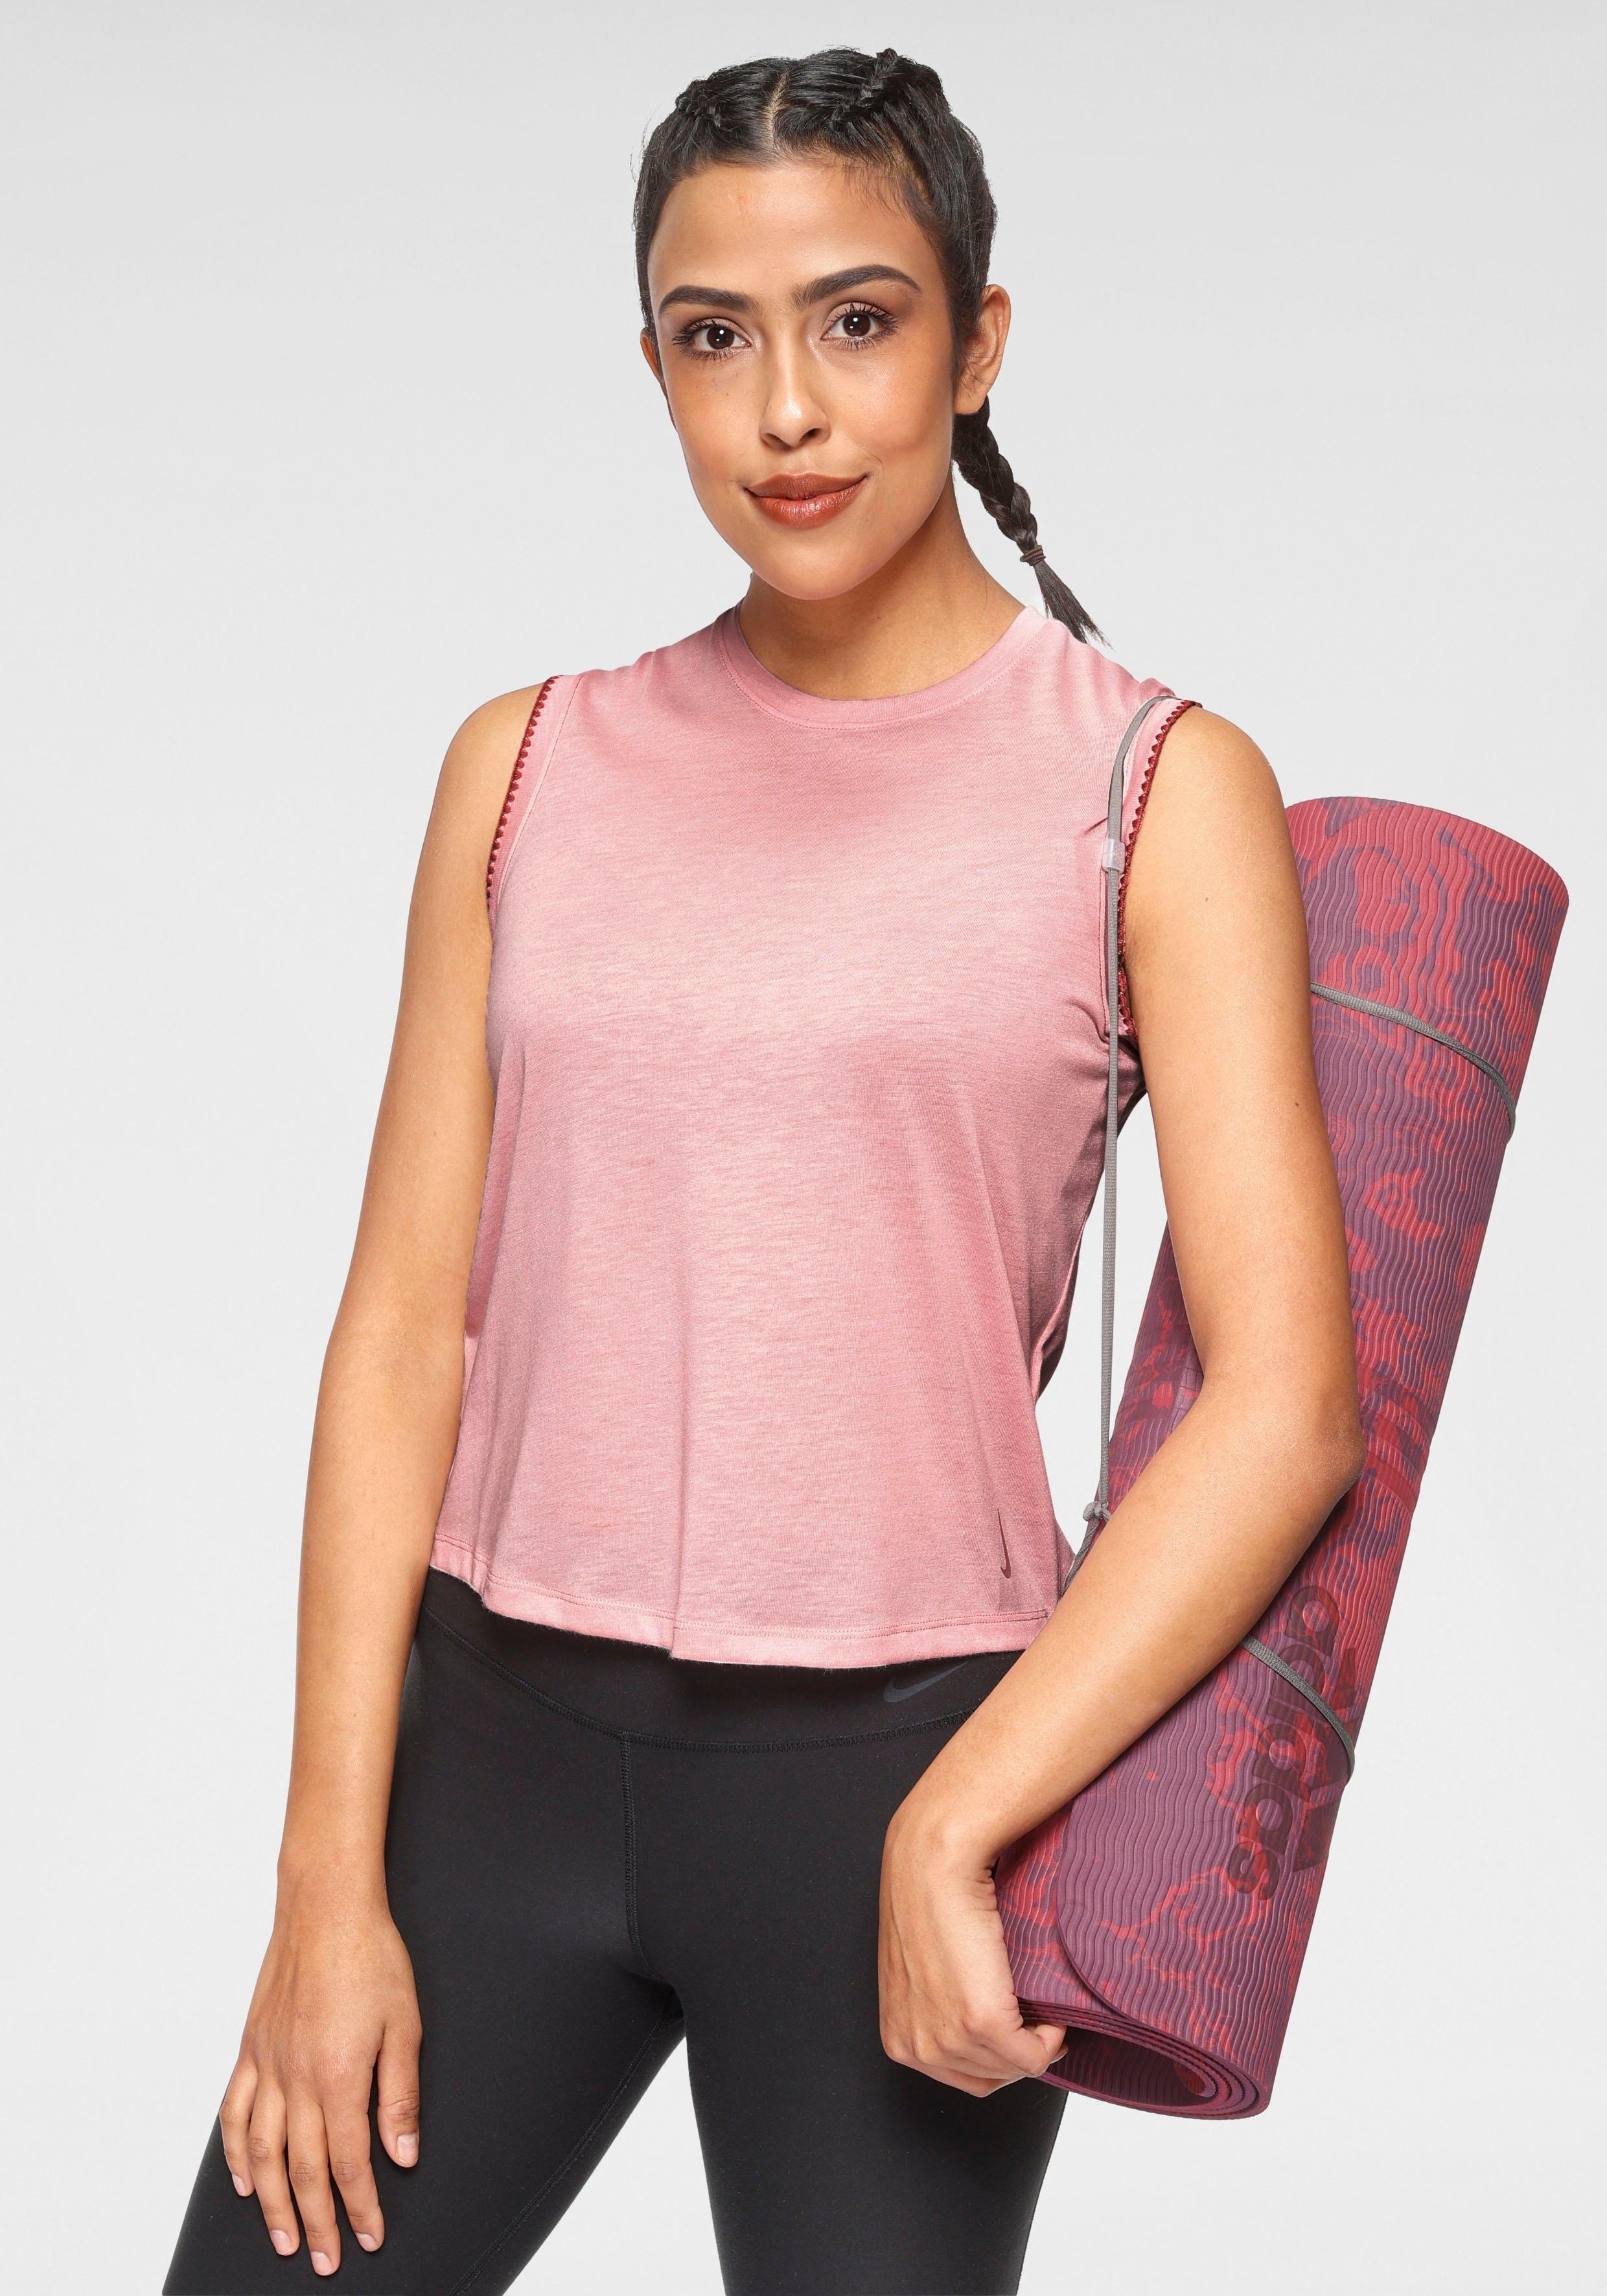 Nike yogatop Nike Yoga Women's Crochet Tank bij OTTO online kopen